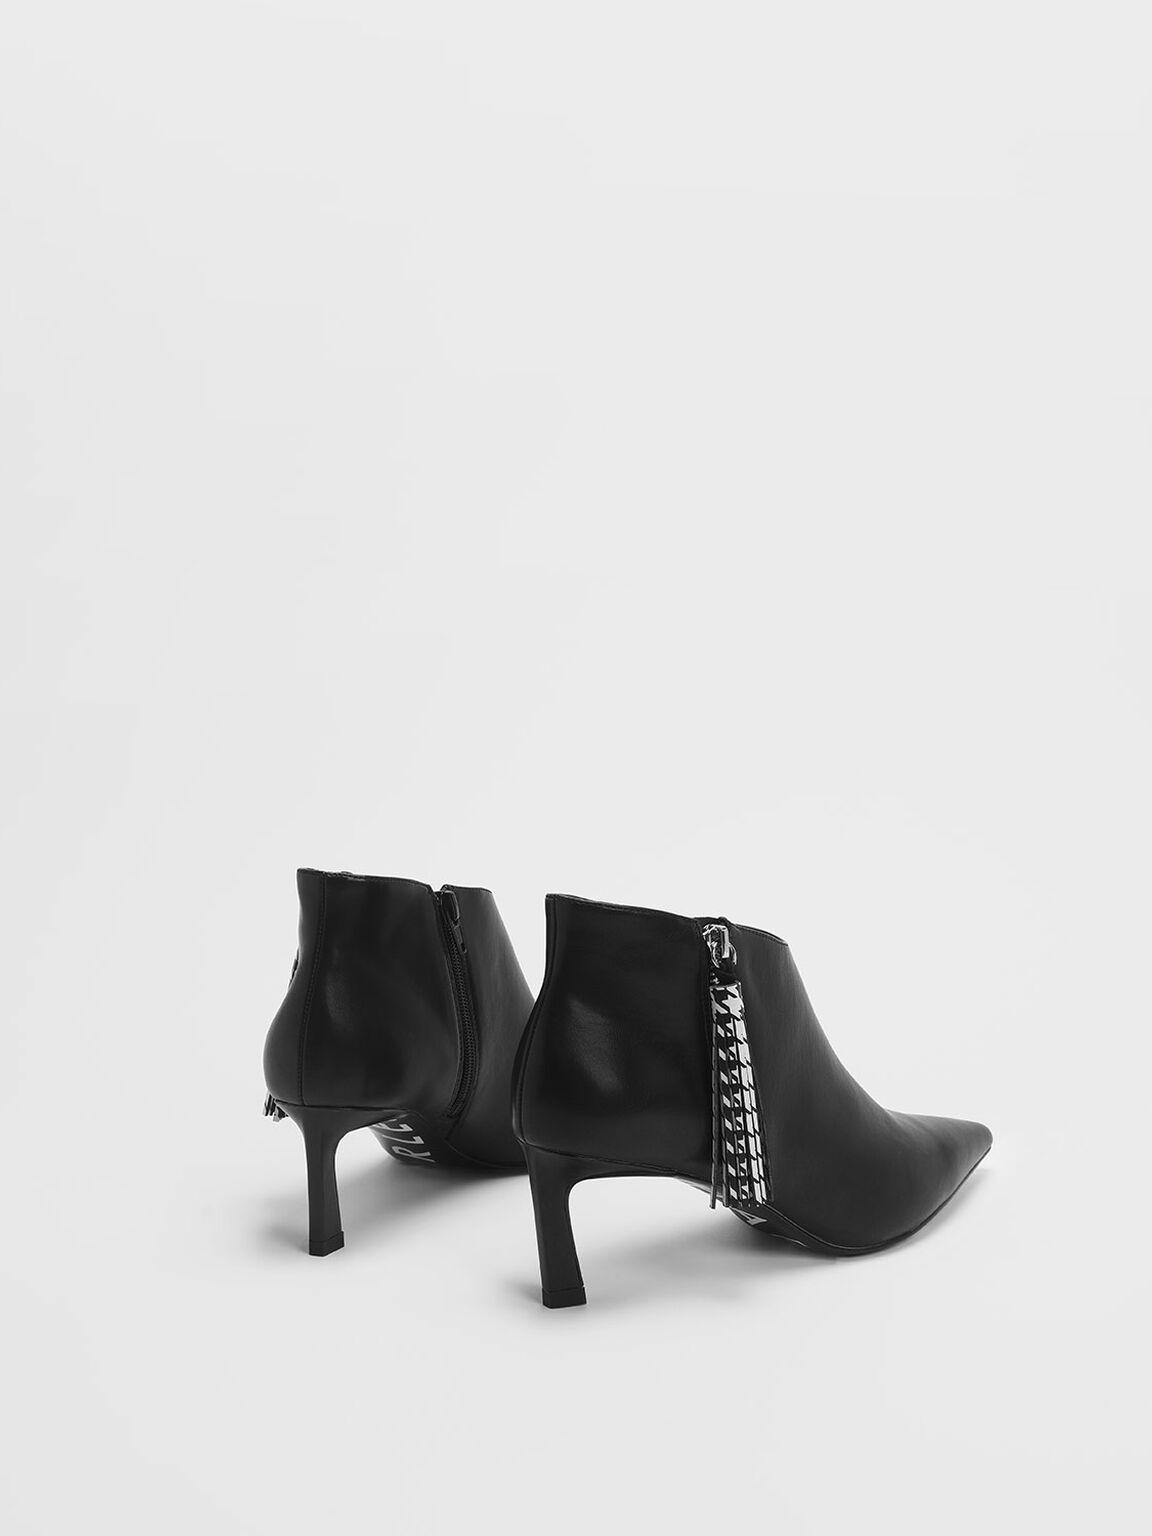 Houndstooth Printed Tassel Heeled Ankle Boots, Black, hi-res